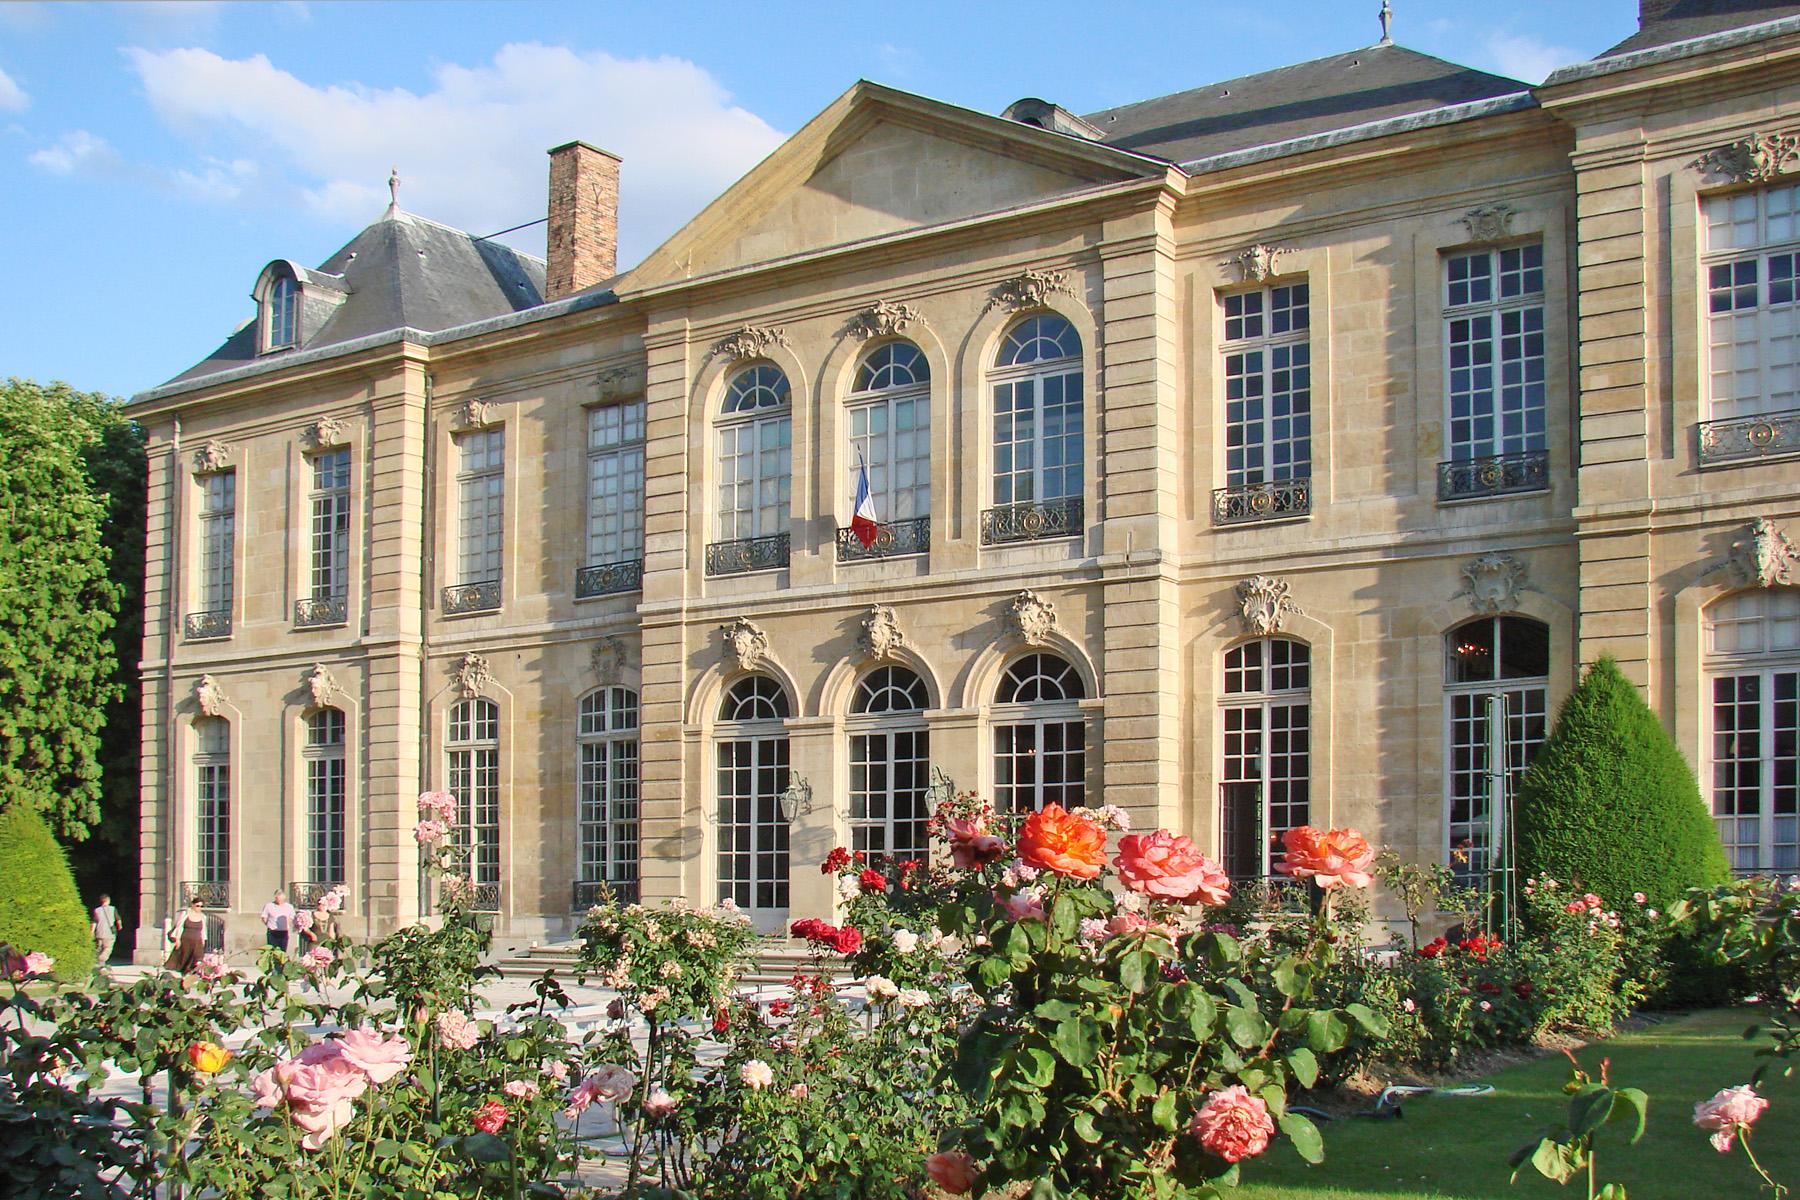 Hotel Biron Paris France